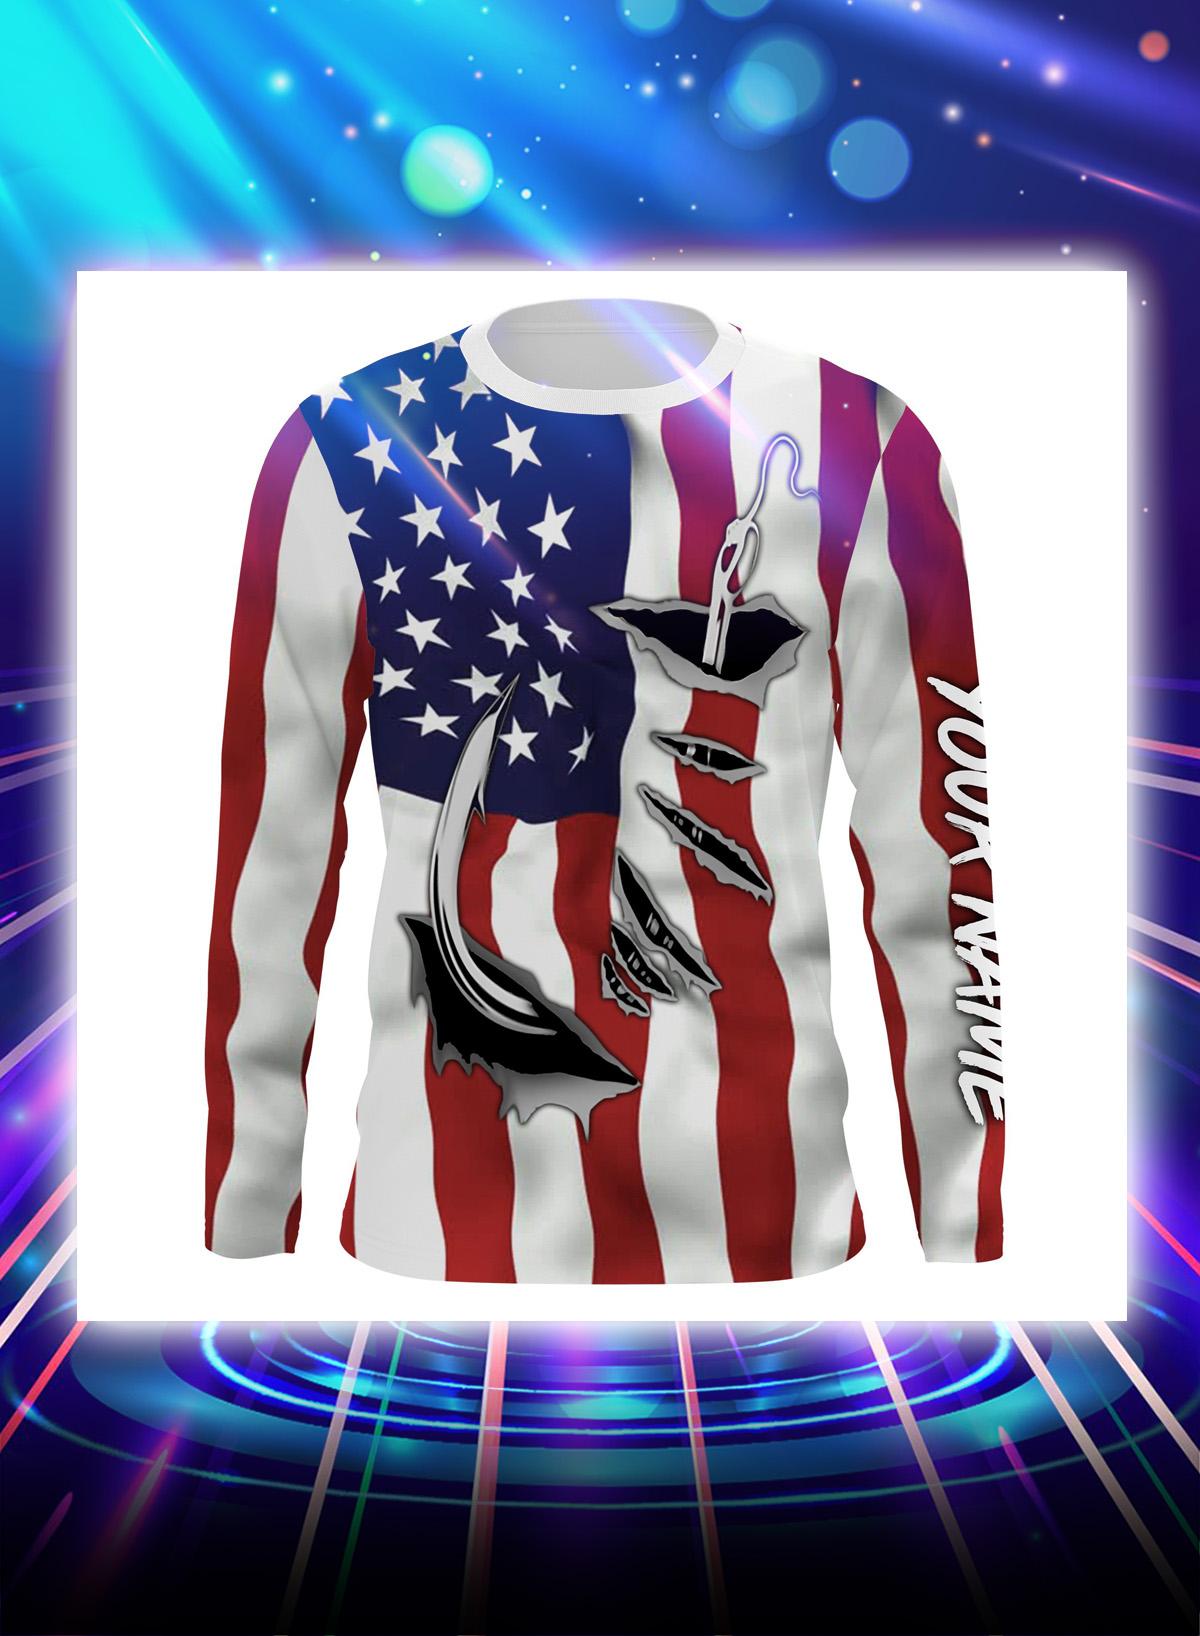 Fishing 3d fish hook american flag personalized customize name long sleeve shirt, sweatshirt